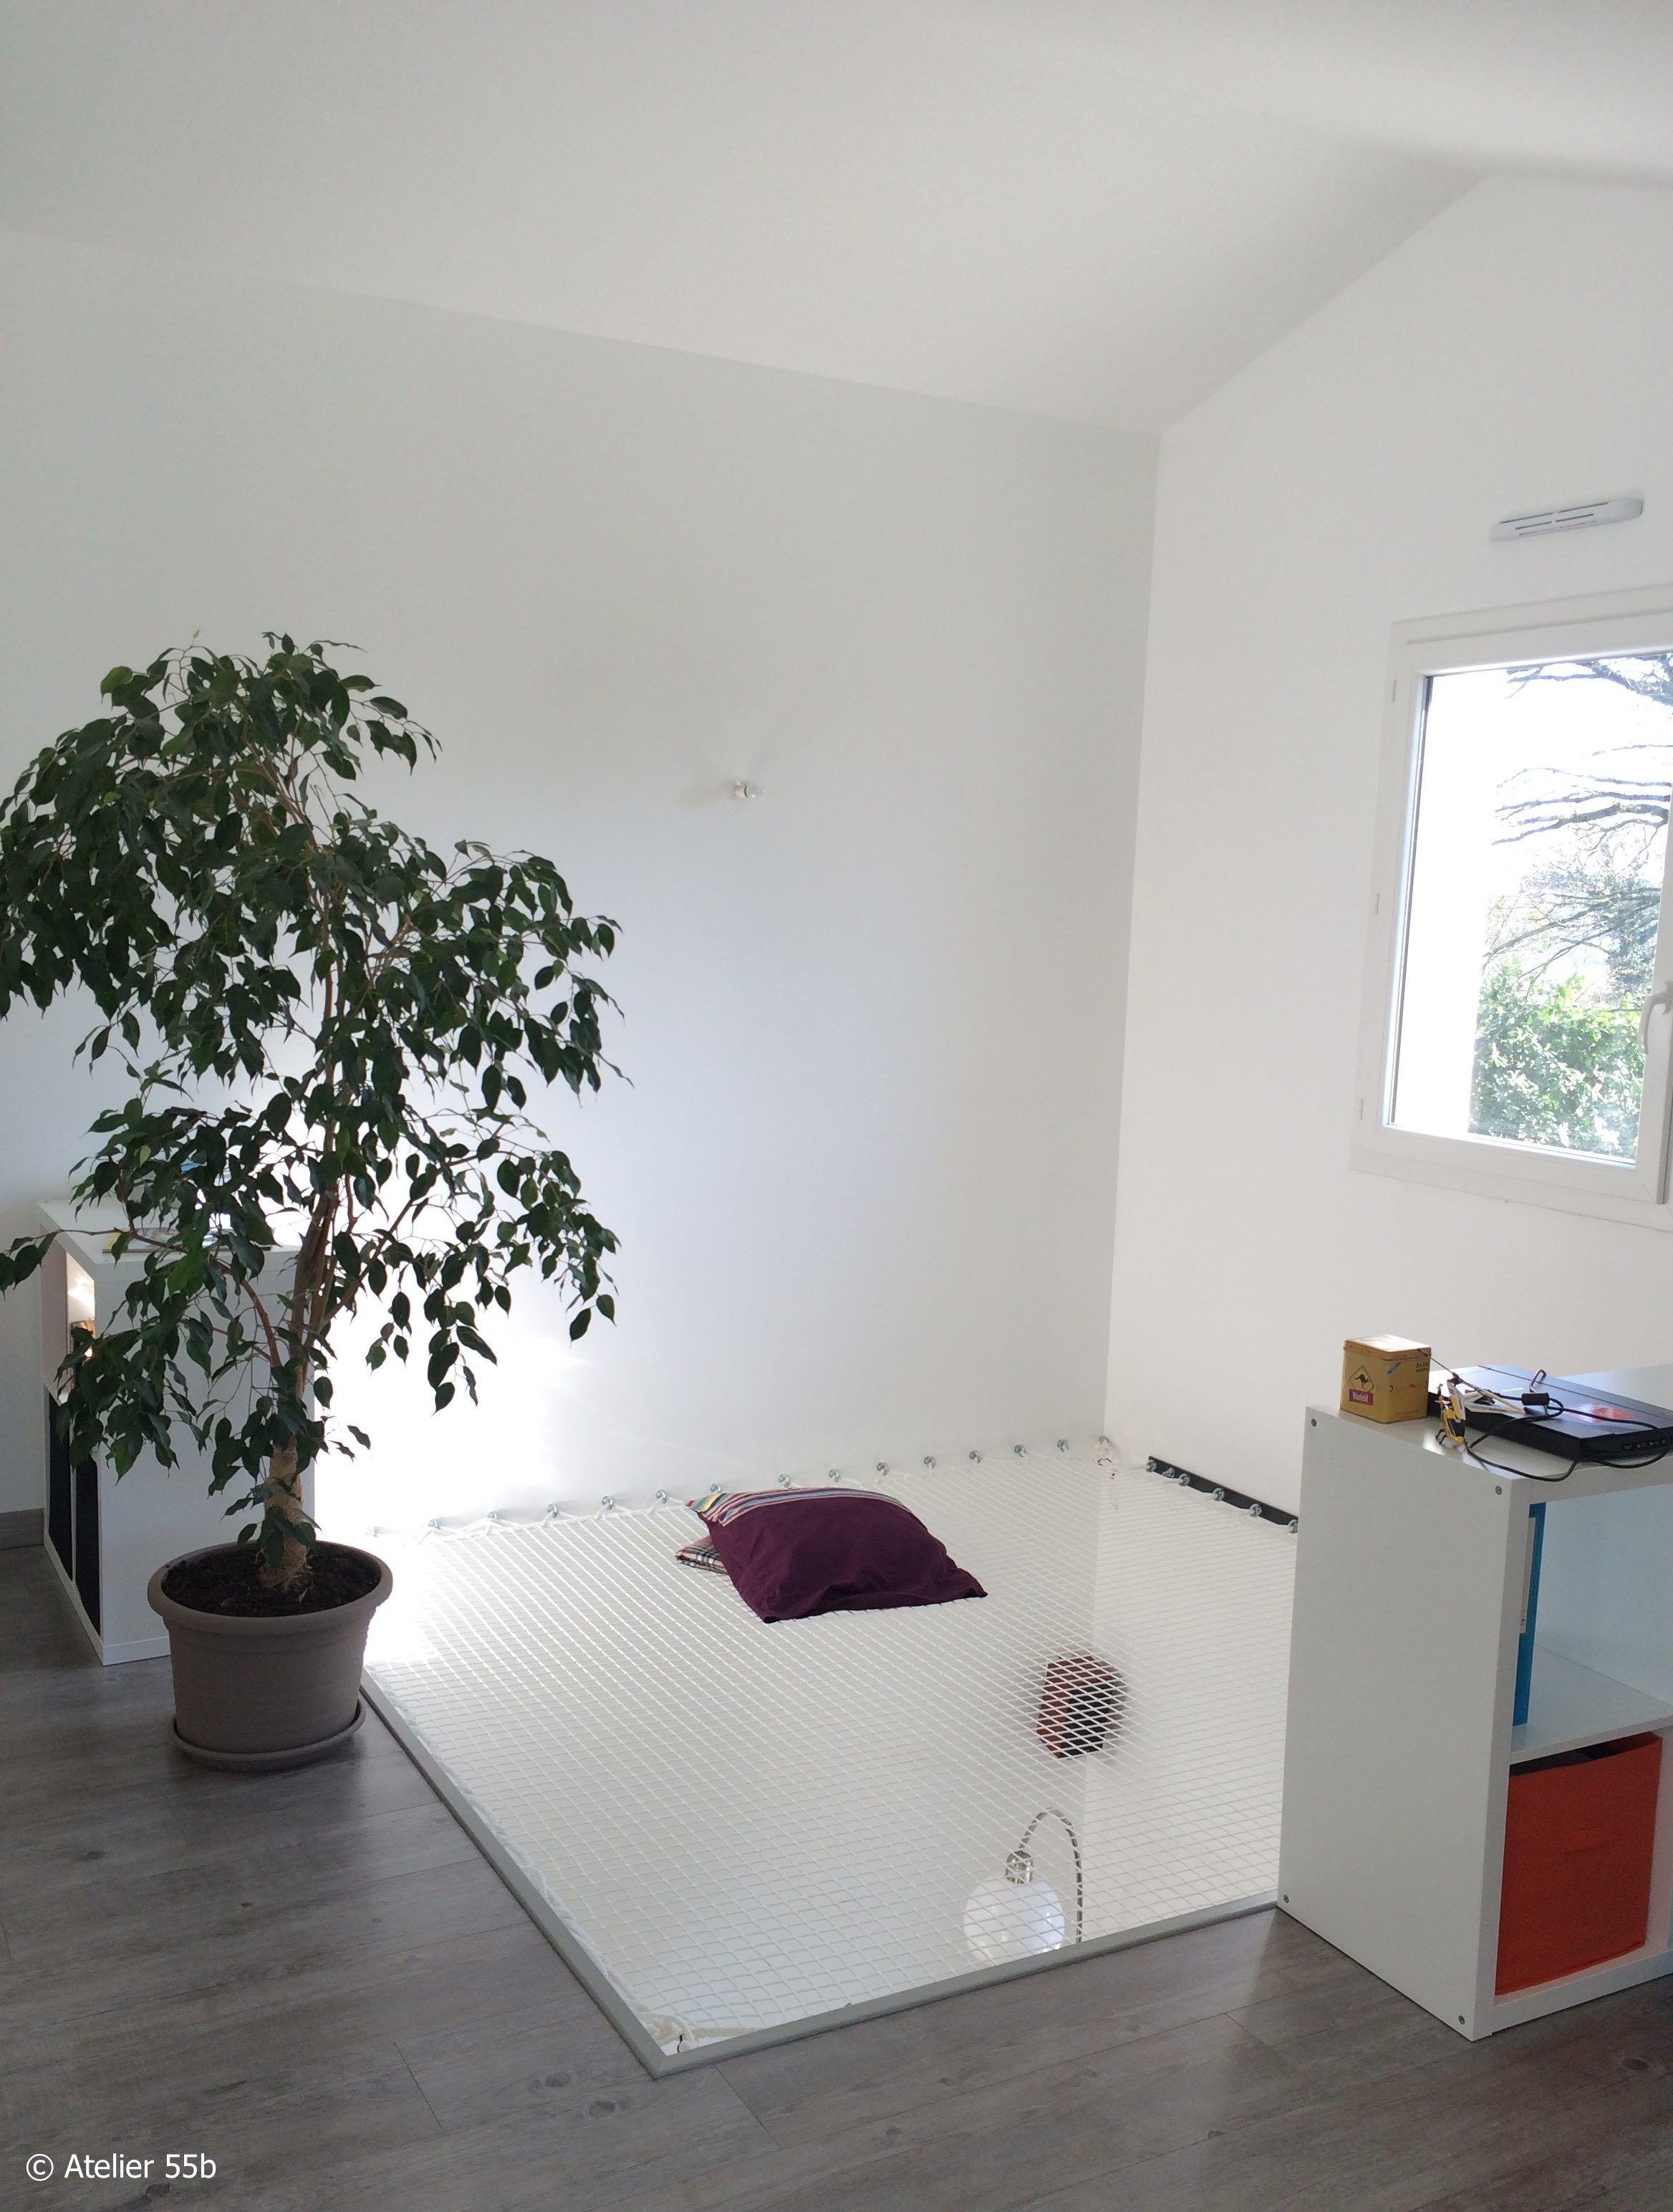 filet d 39 habitation vu depuis la mezzanine netz pinterest mezzanine. Black Bedroom Furniture Sets. Home Design Ideas